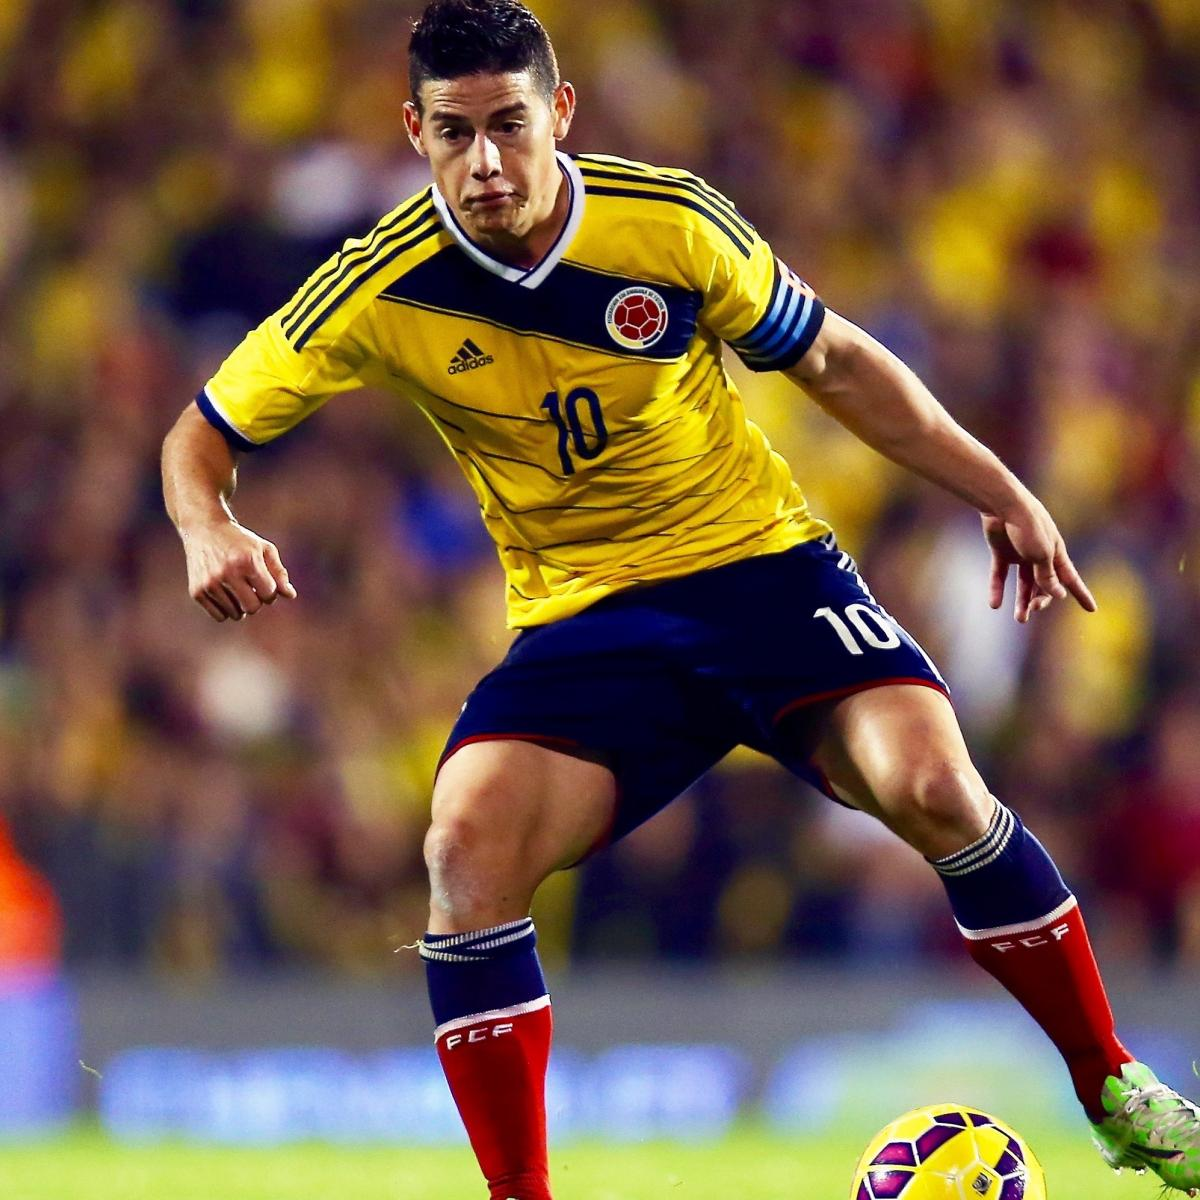 Tottenham Vs Ajax Score: Colombia Vs. Peru: Live Score, Highlights From Copa